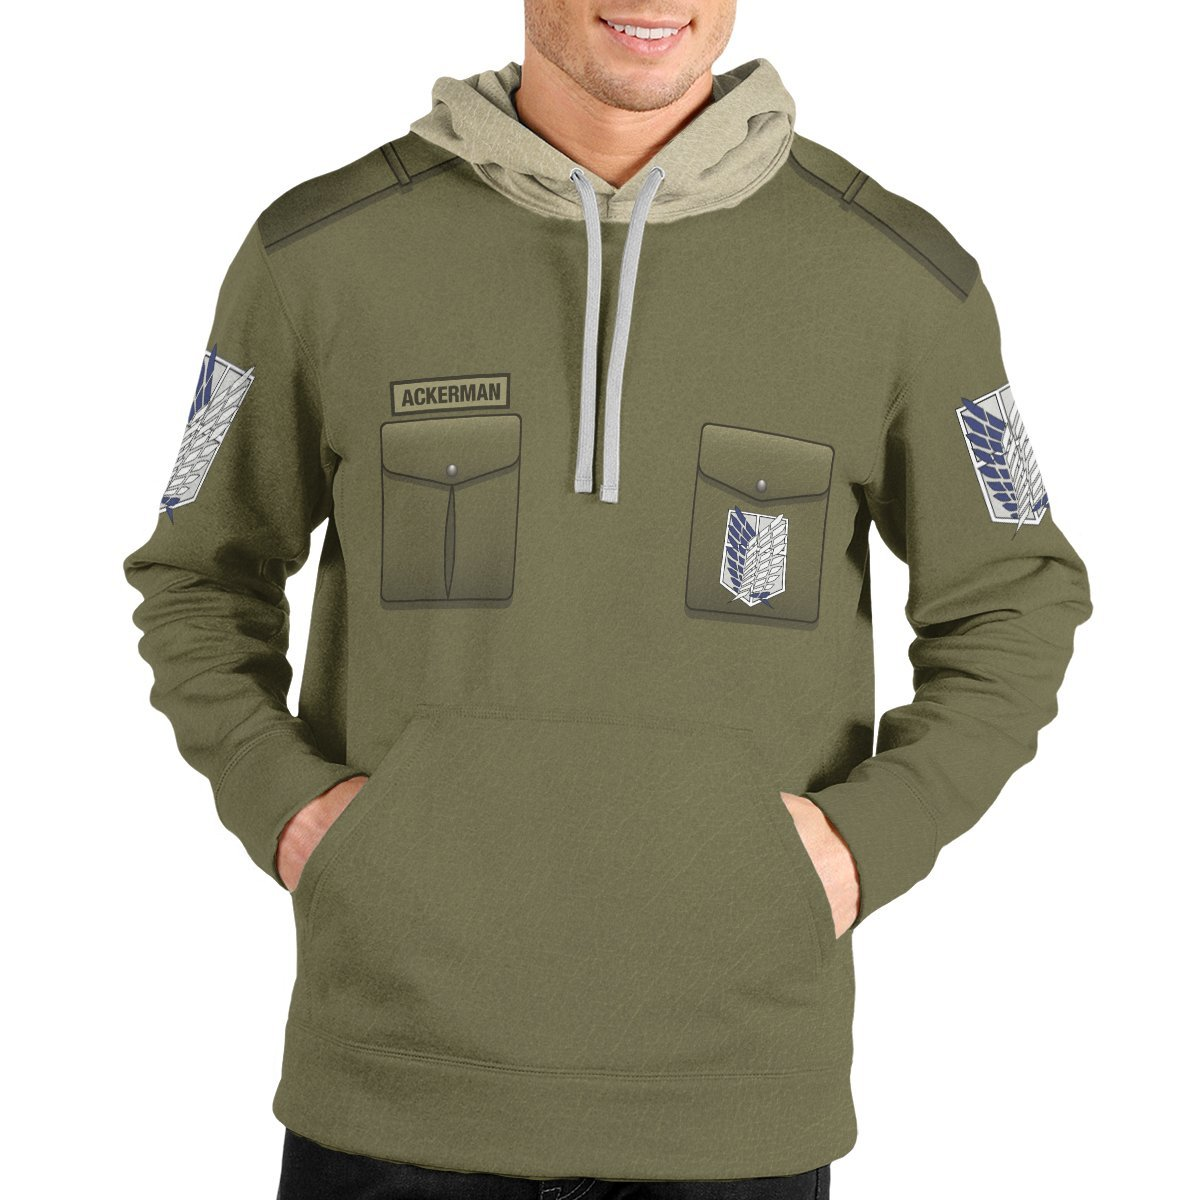 personalized new survey corps uniform unisex pullover hoodie 744494 - Otaku Treat